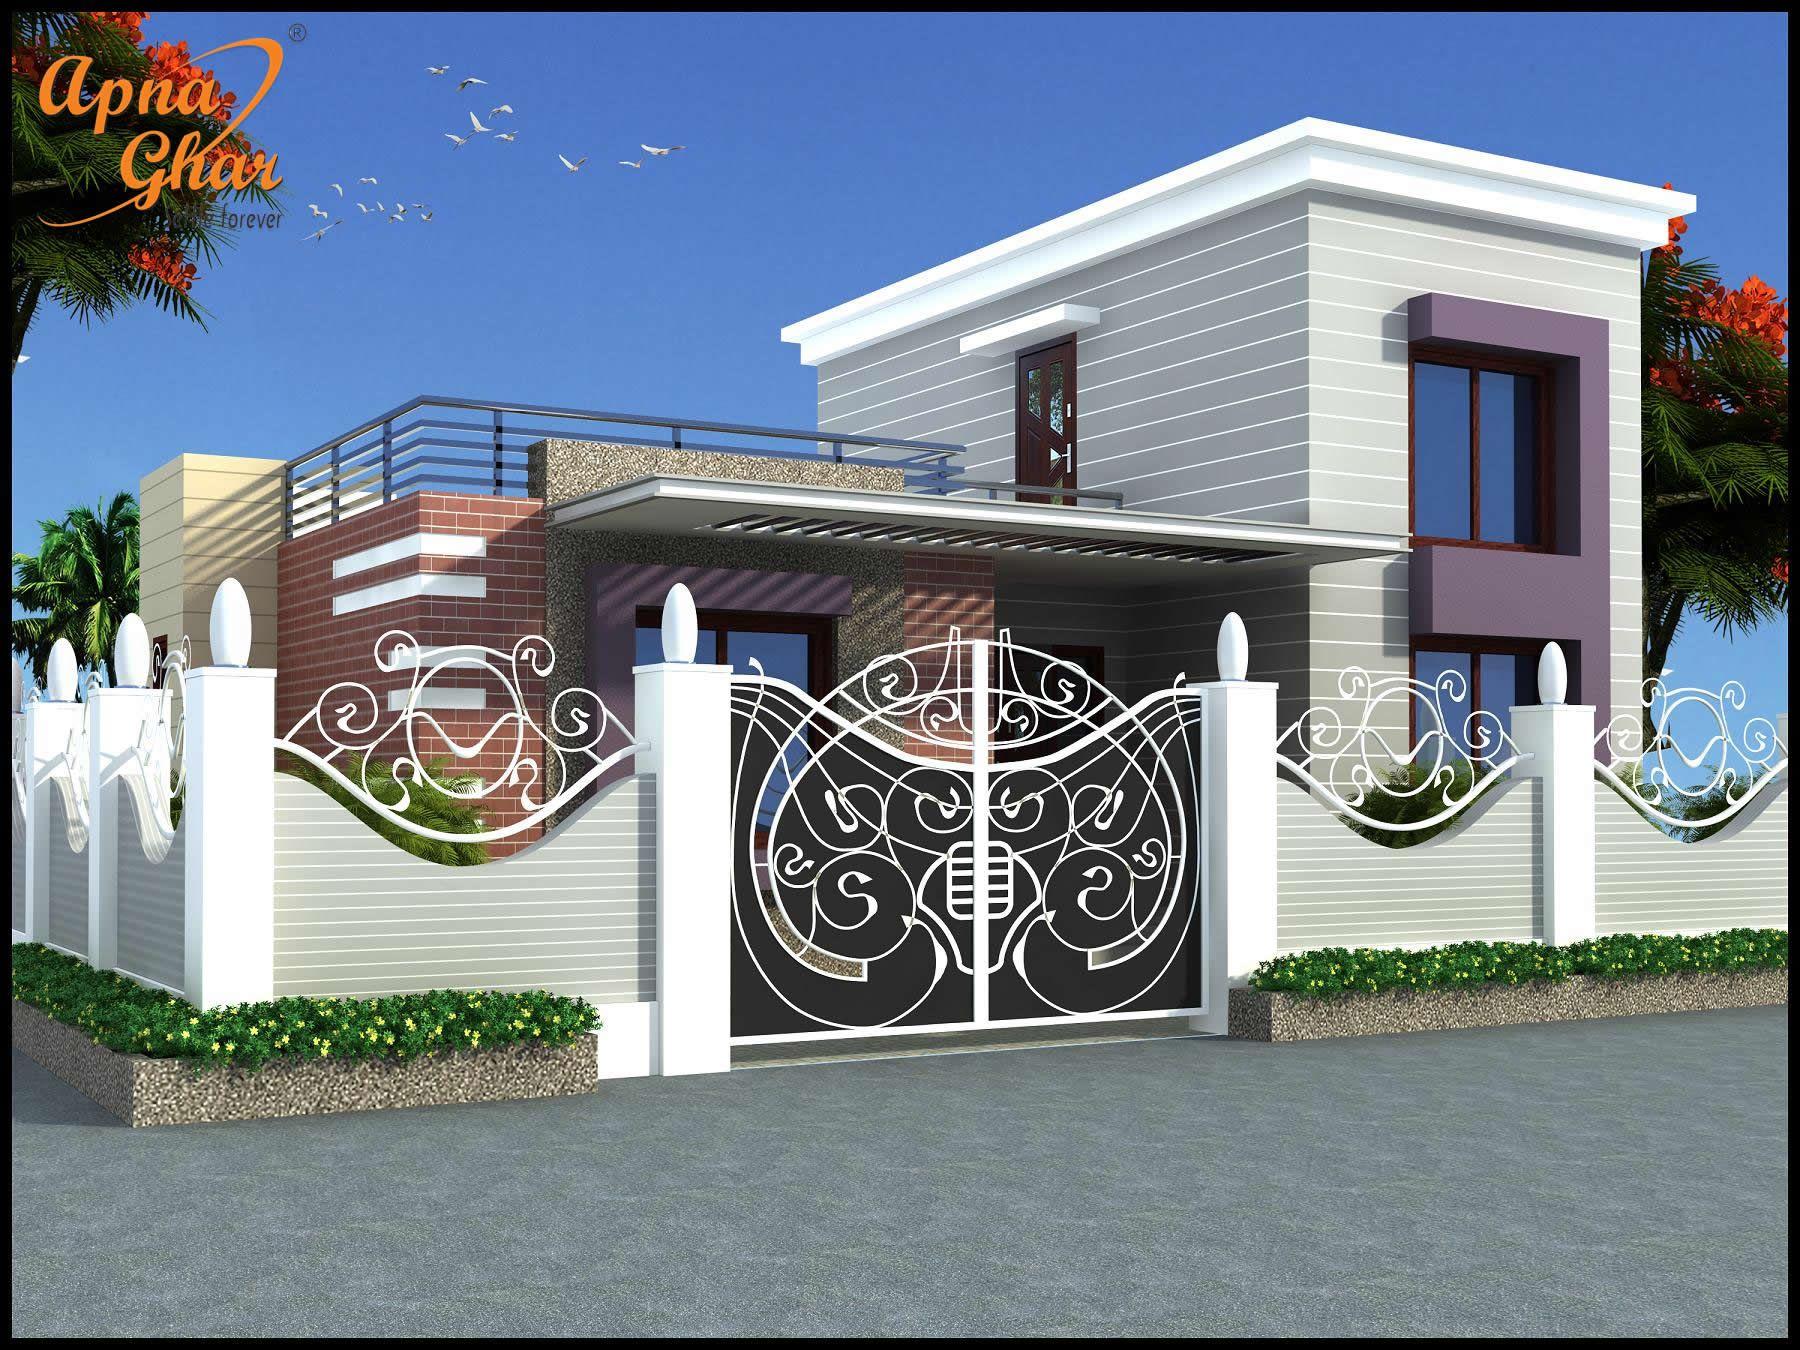 3 Bedrooms Simplex House Design In 270m2 (15m X 18m) 3 Bedroom, Modern